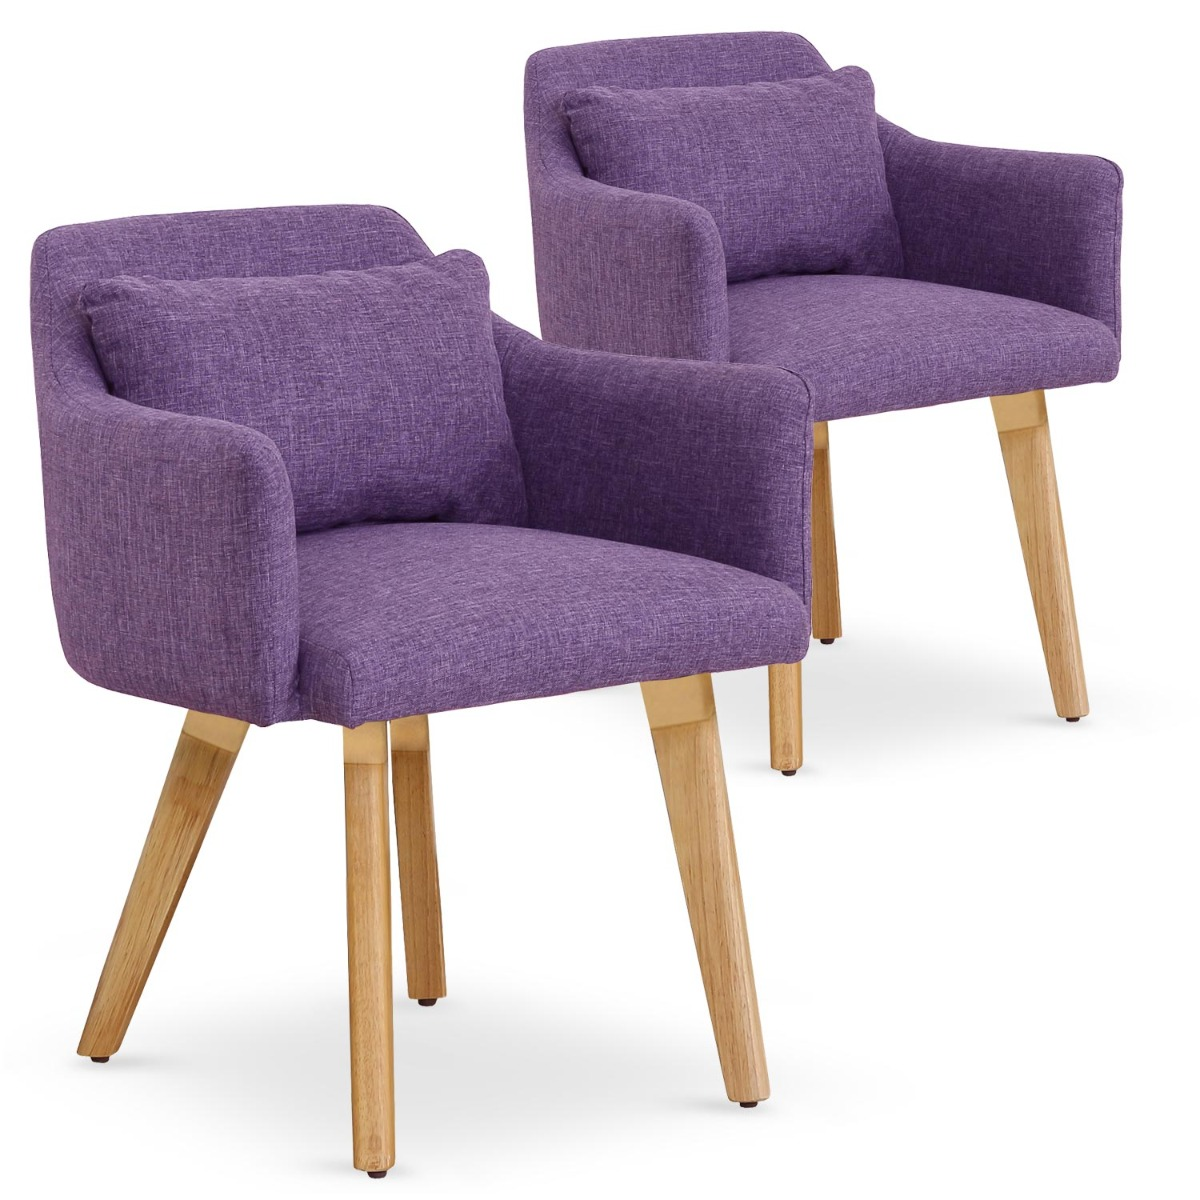 Lot de 2 fauteuils scandinaves Gybson Tissu Violet